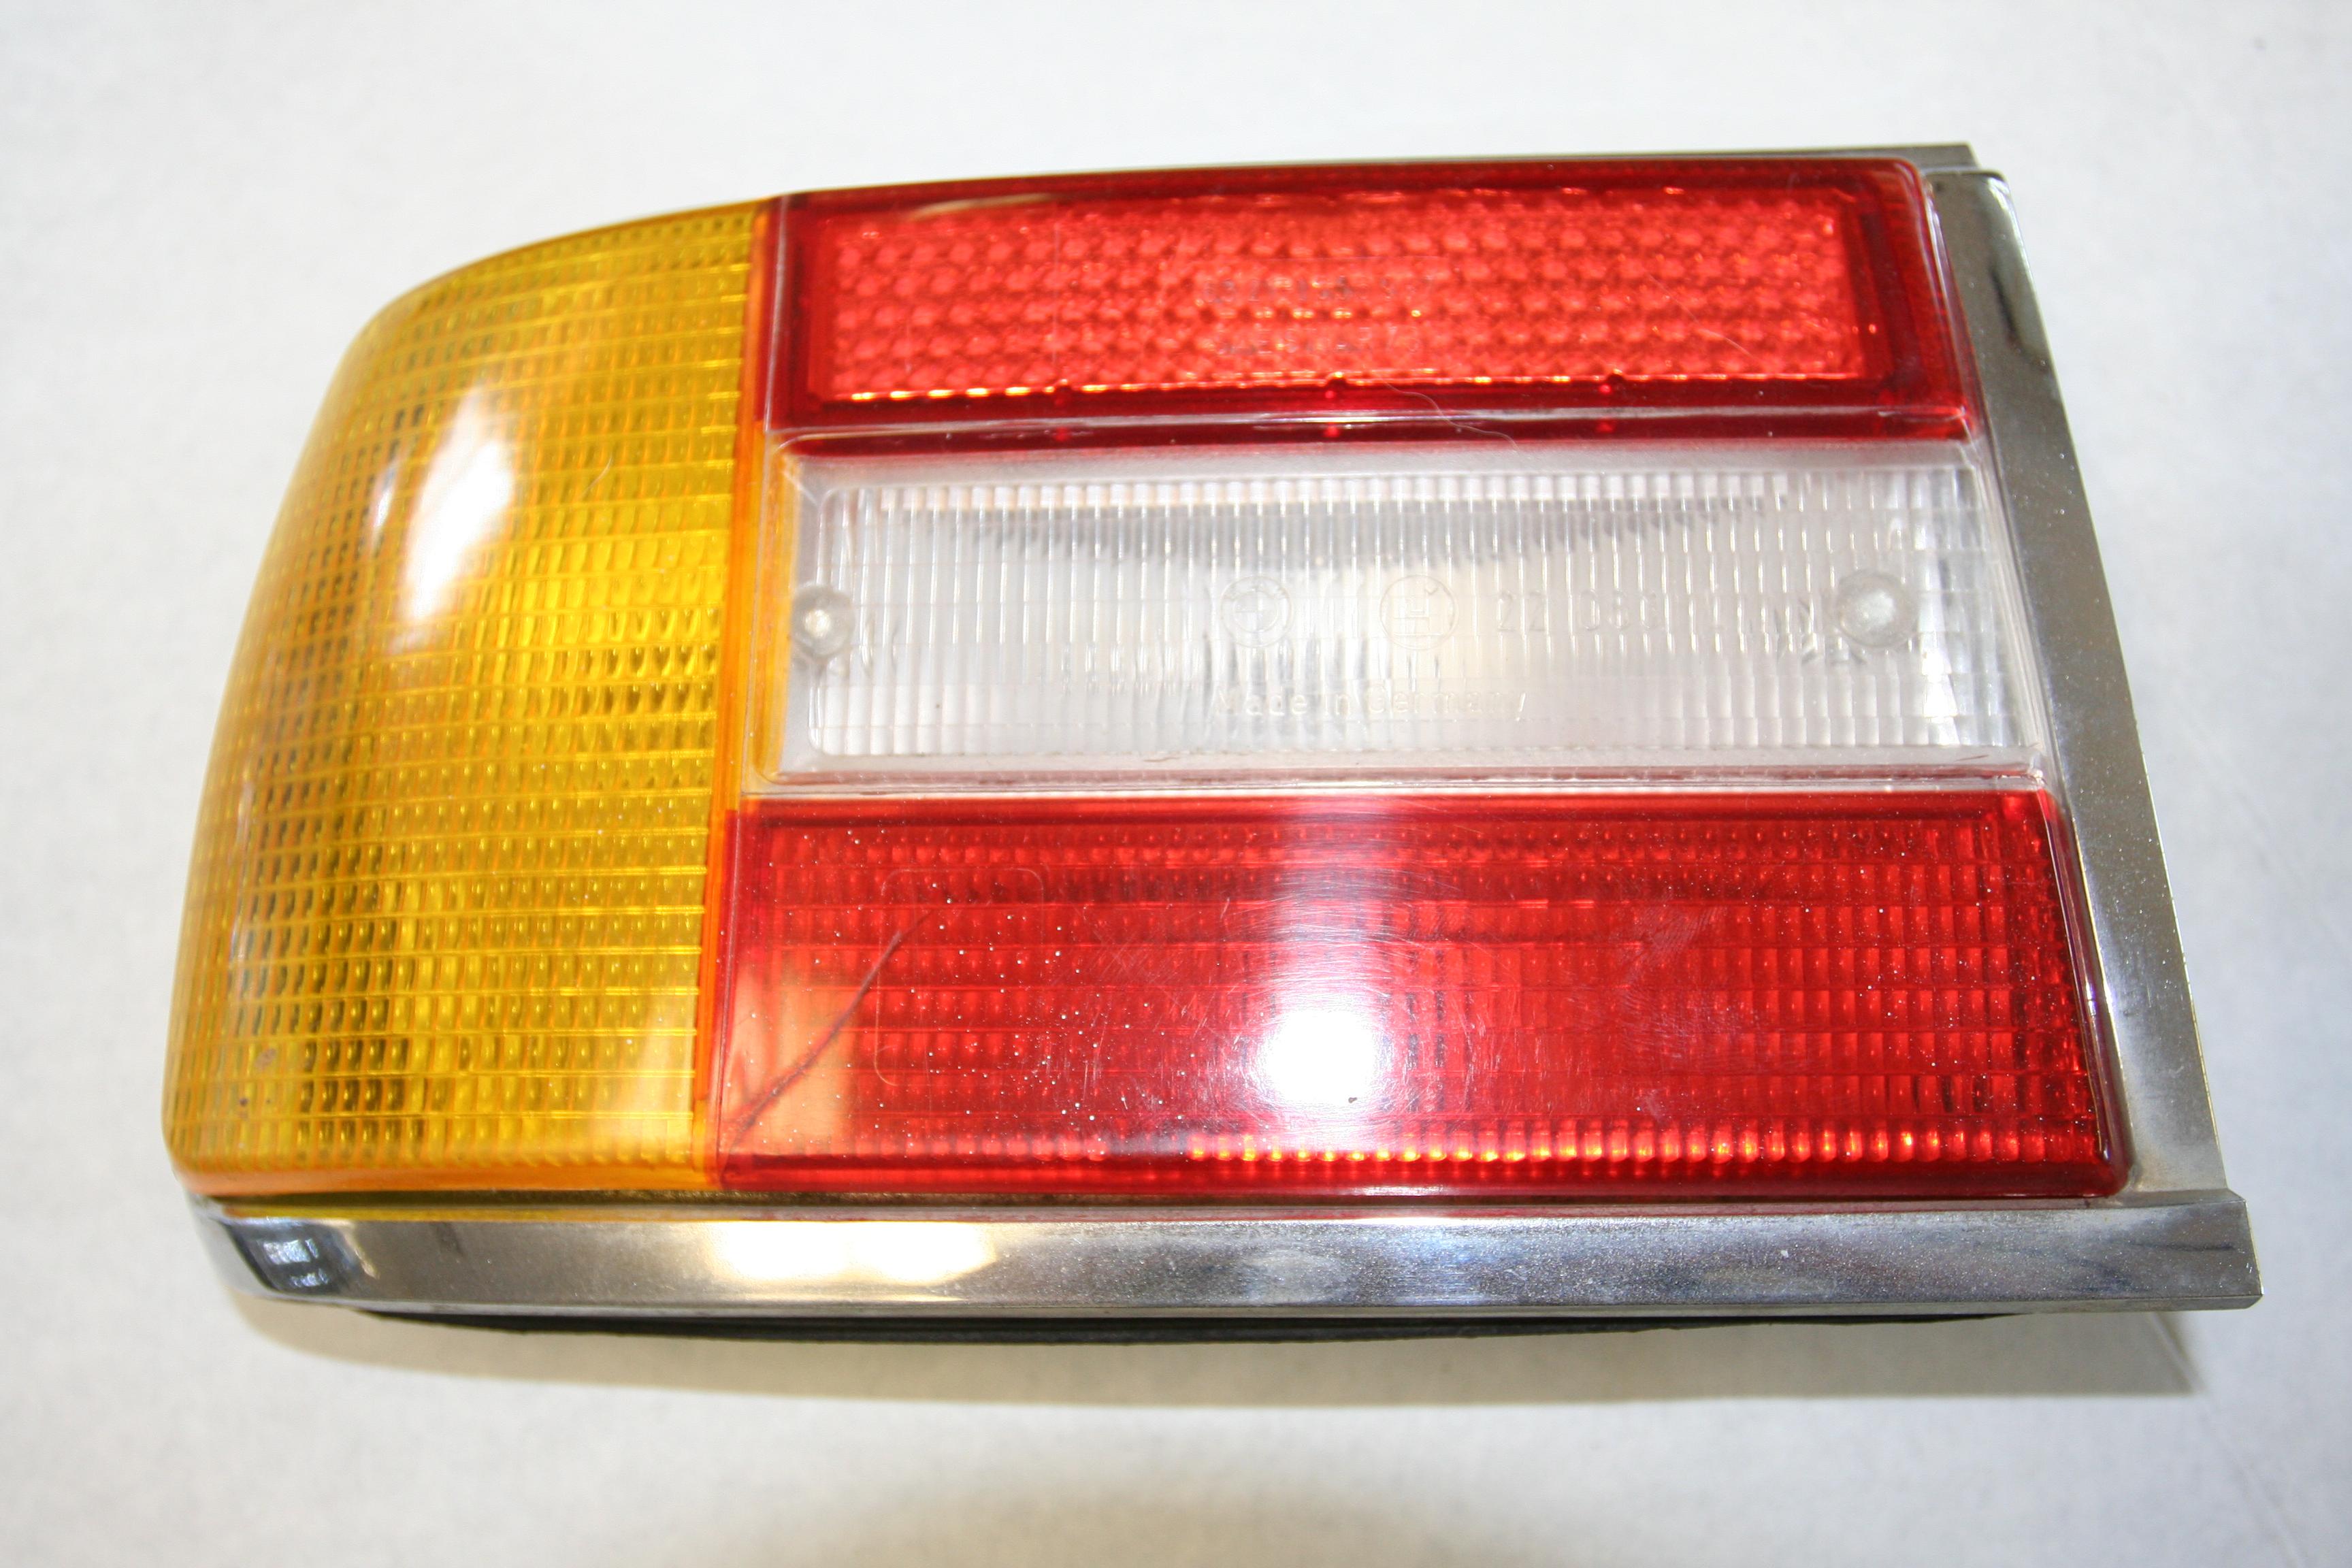 2002 1974-1976 Rear Tail Lights - Parts For Sale - BMW 2002 FAQ